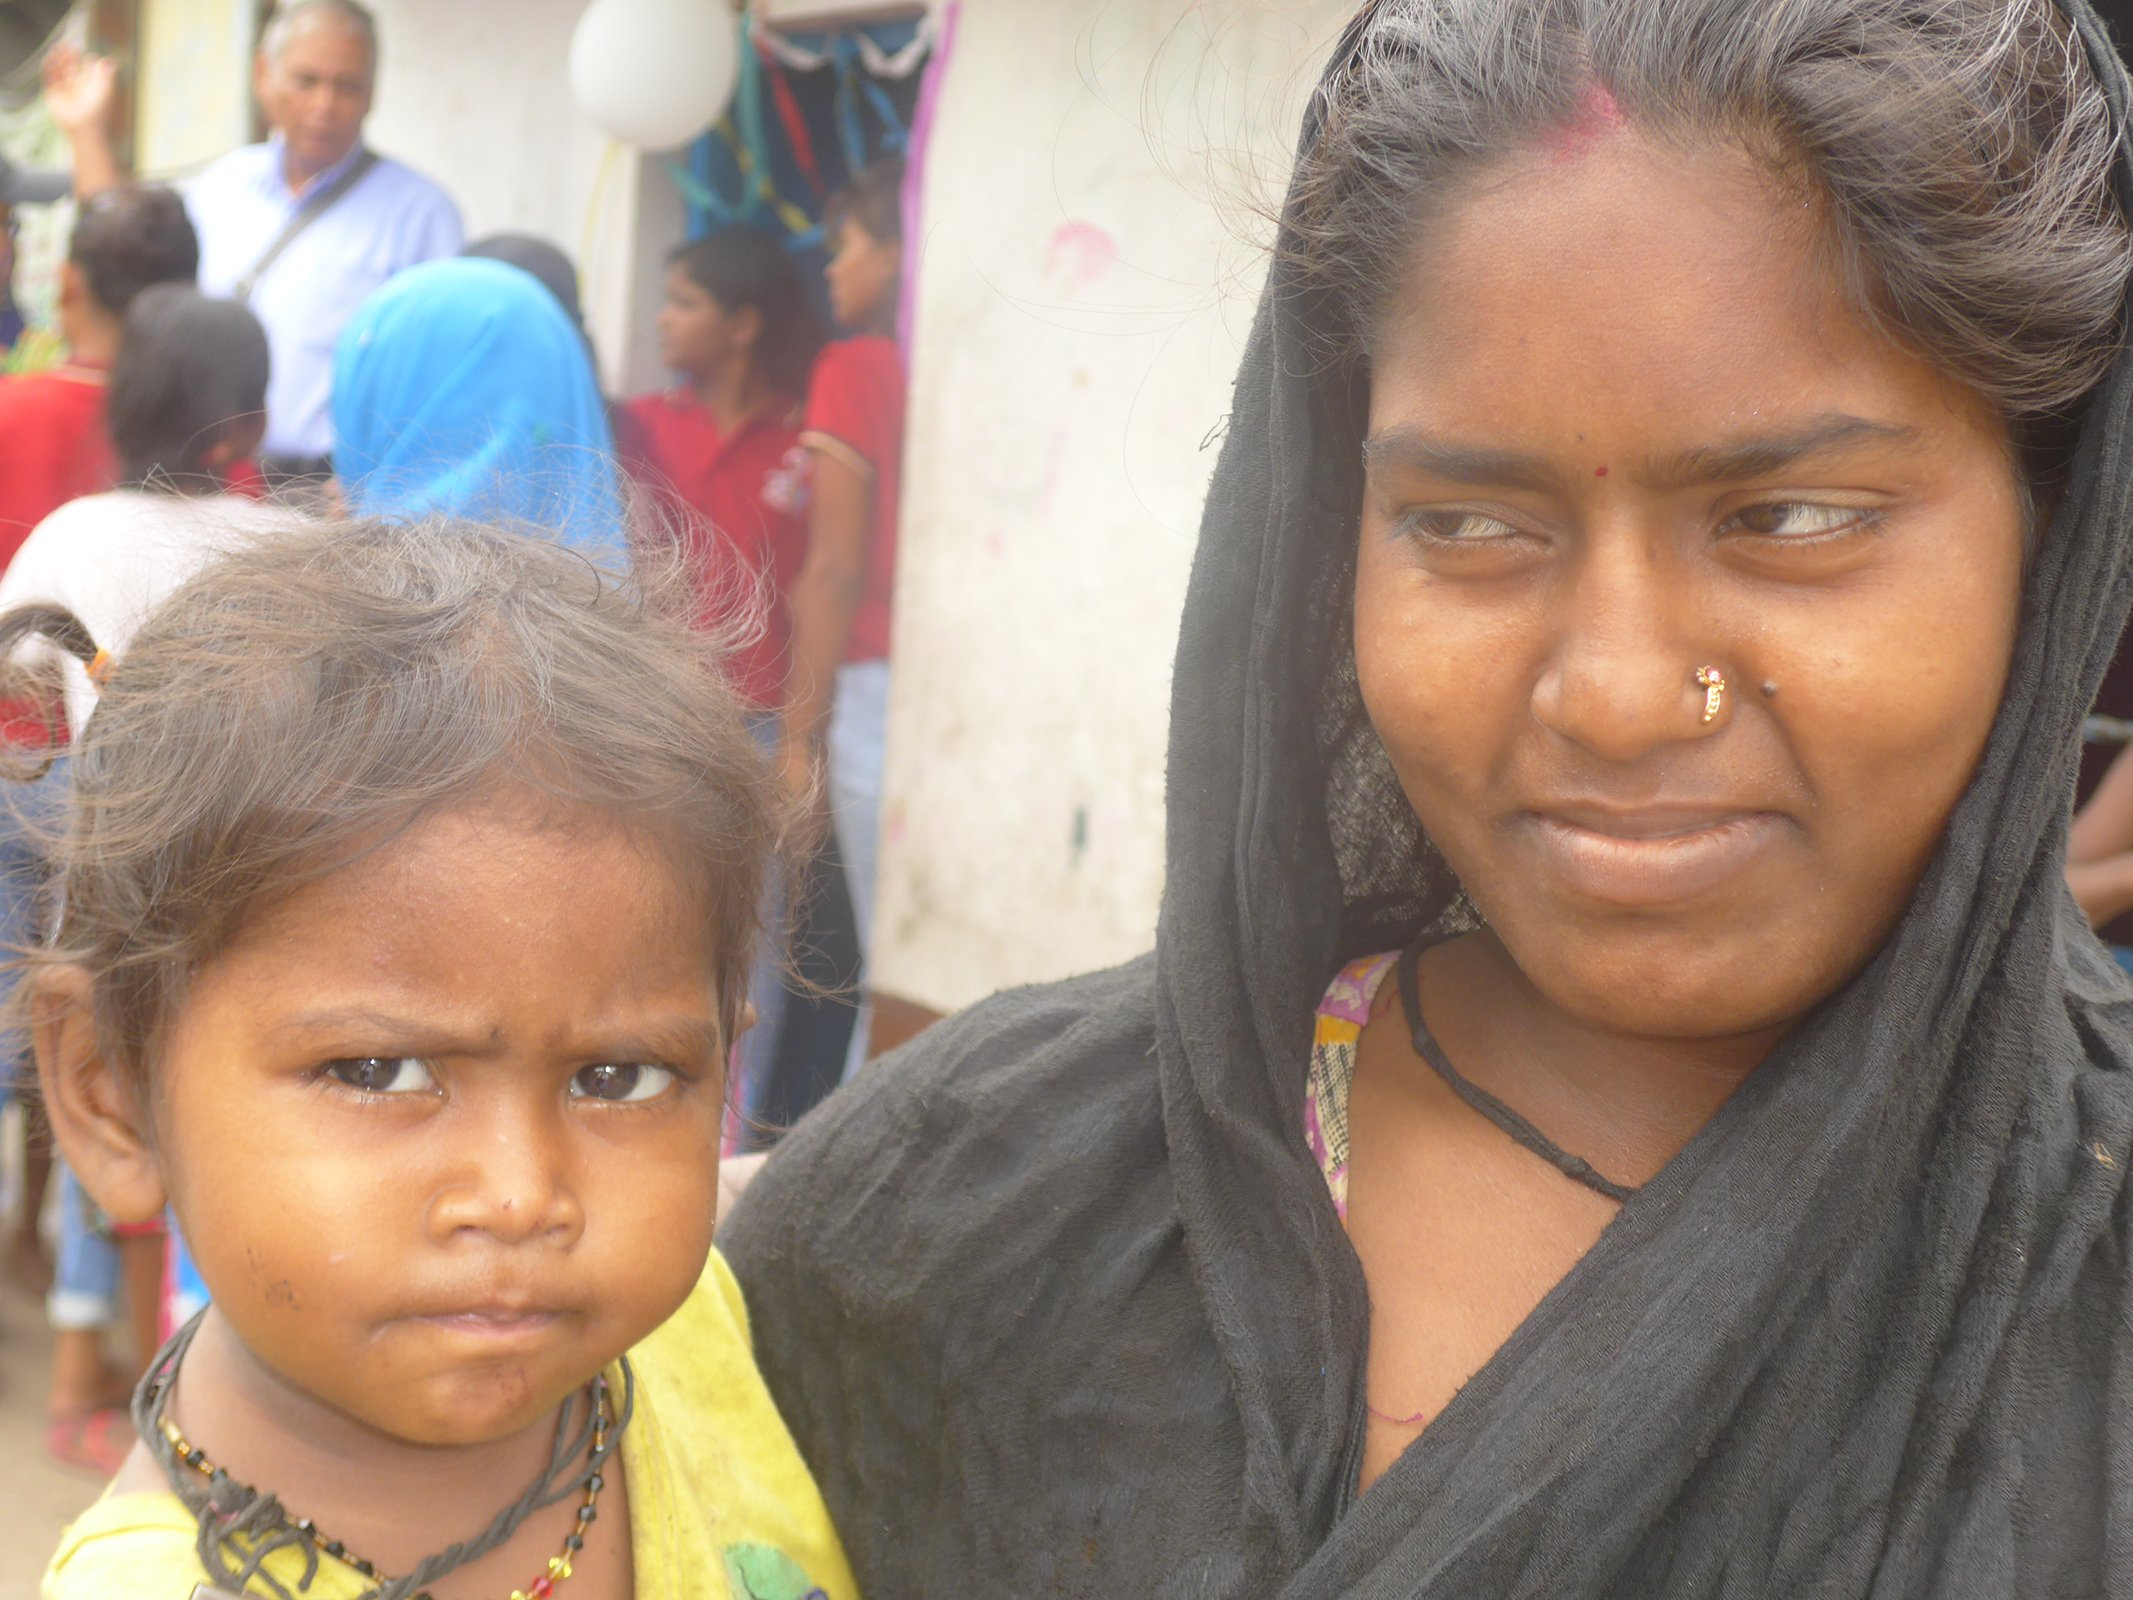 sos india aiuti umanitari in india